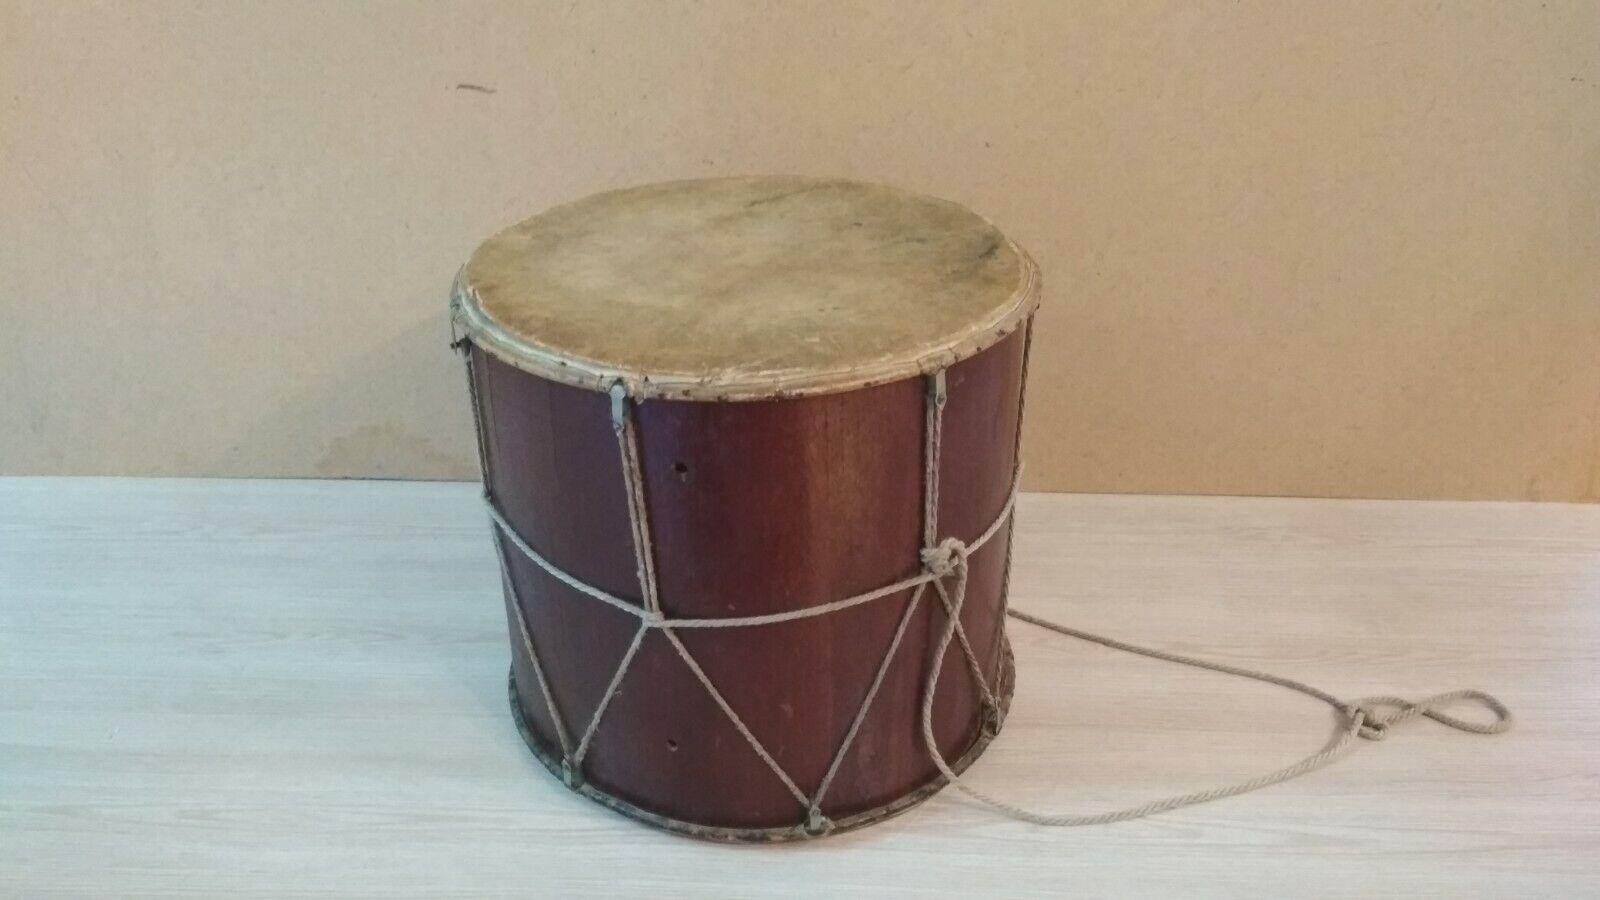 Vintage Armenian Drum Dhol 1970s.